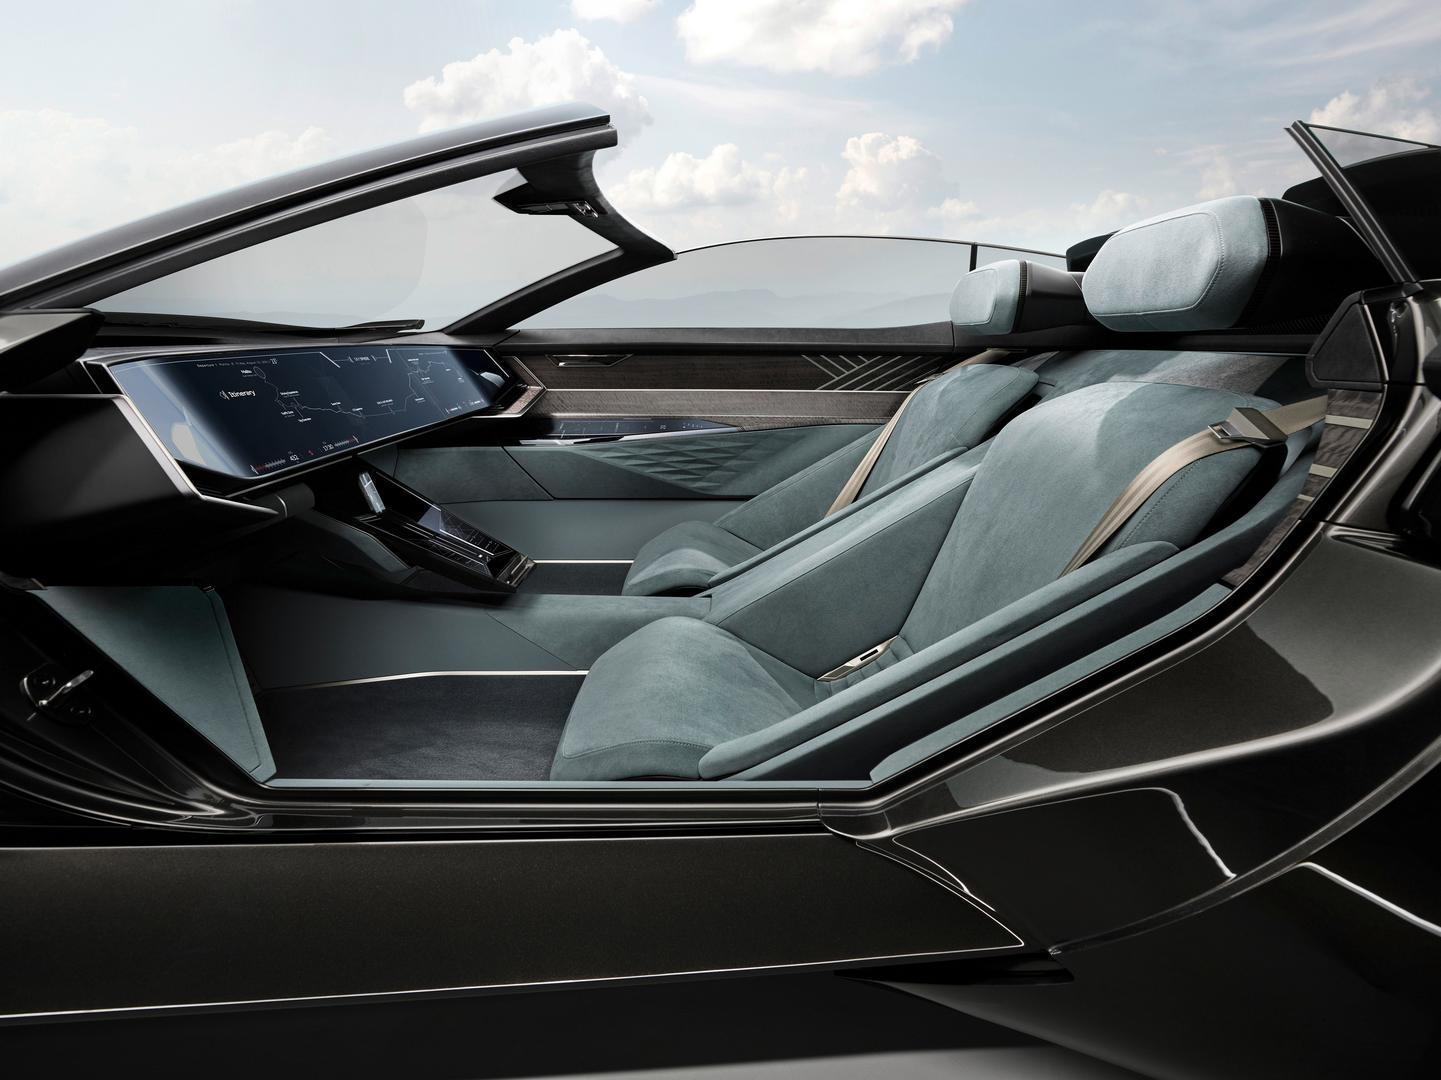 Audi skysphere seats